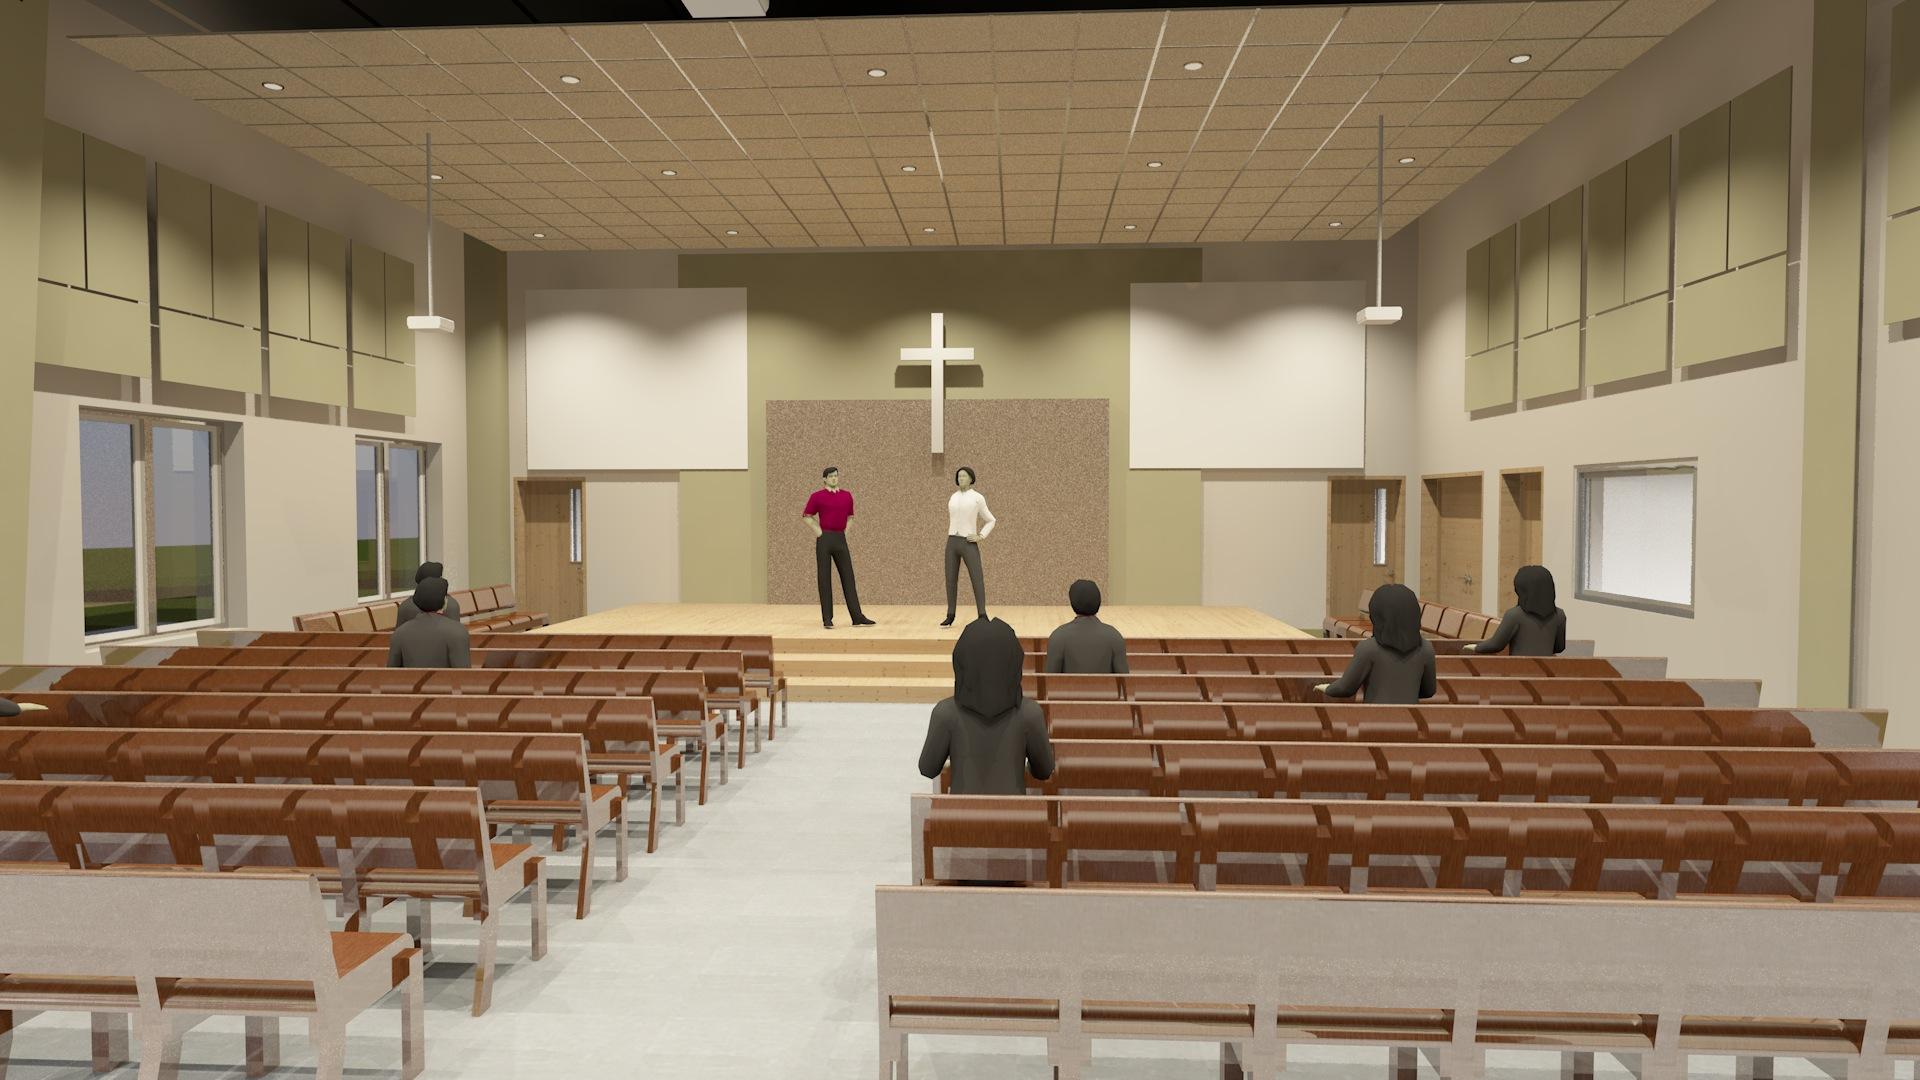 Interior_rendering_of_Phase_One_sanctuary-1.jpg